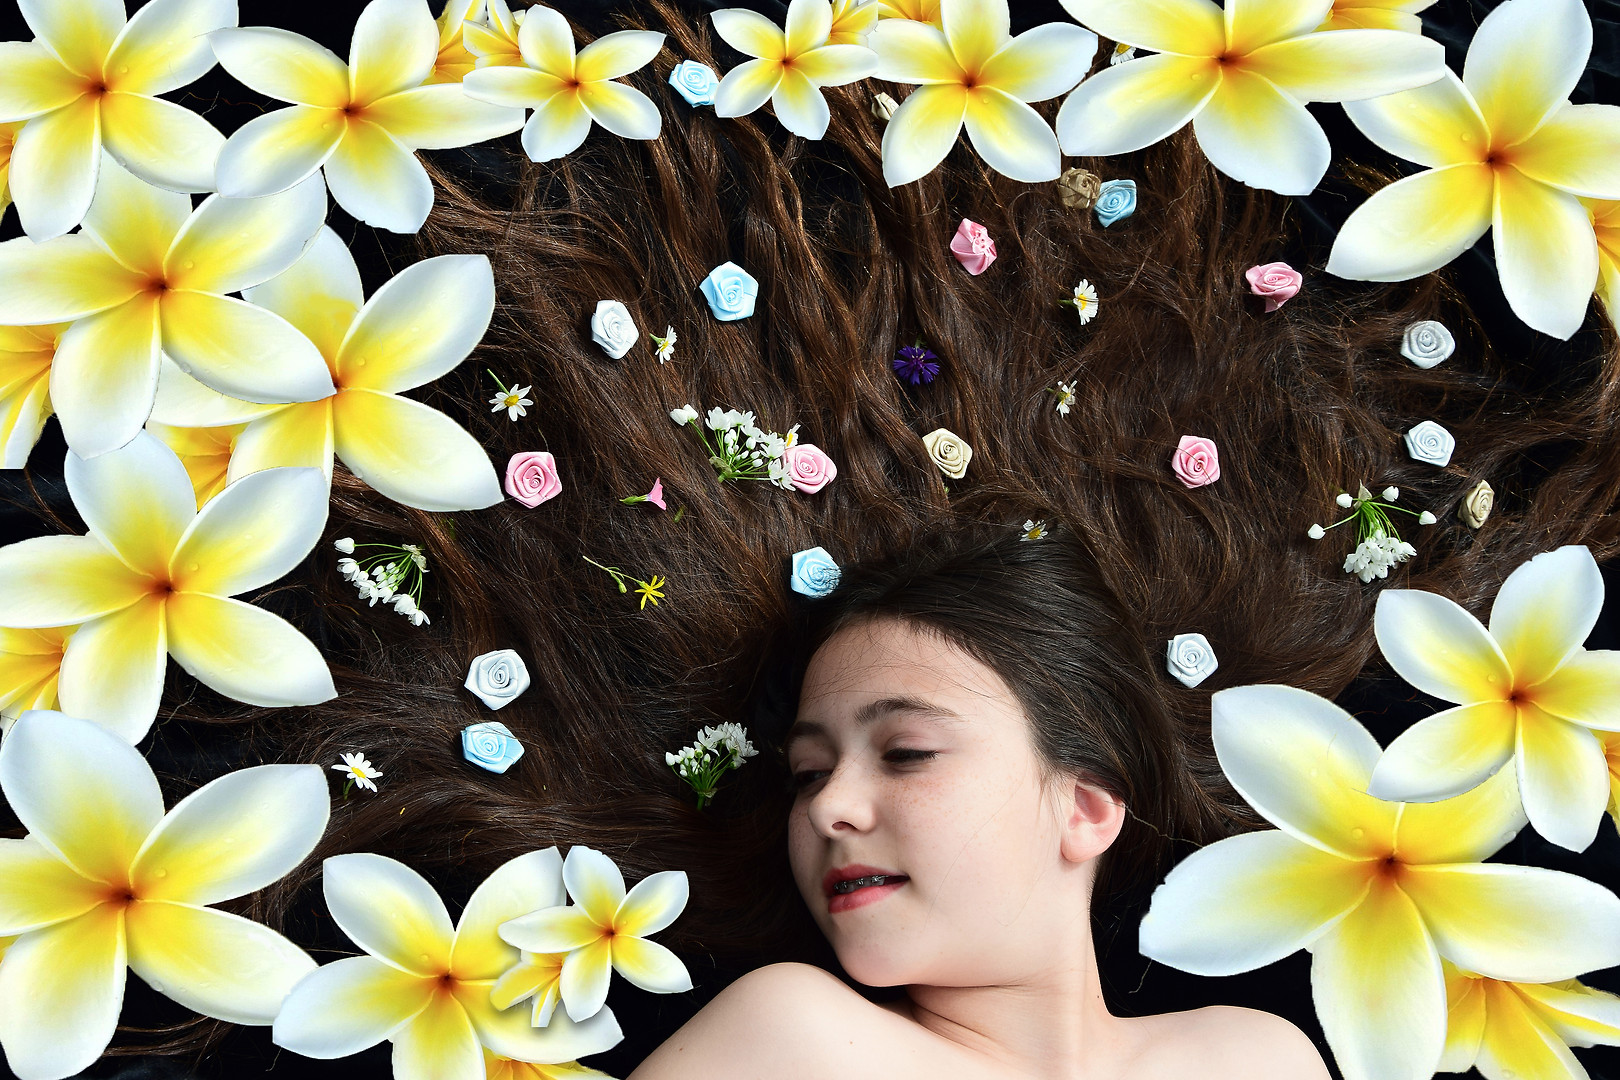 DSC_0772פרחים.jpg